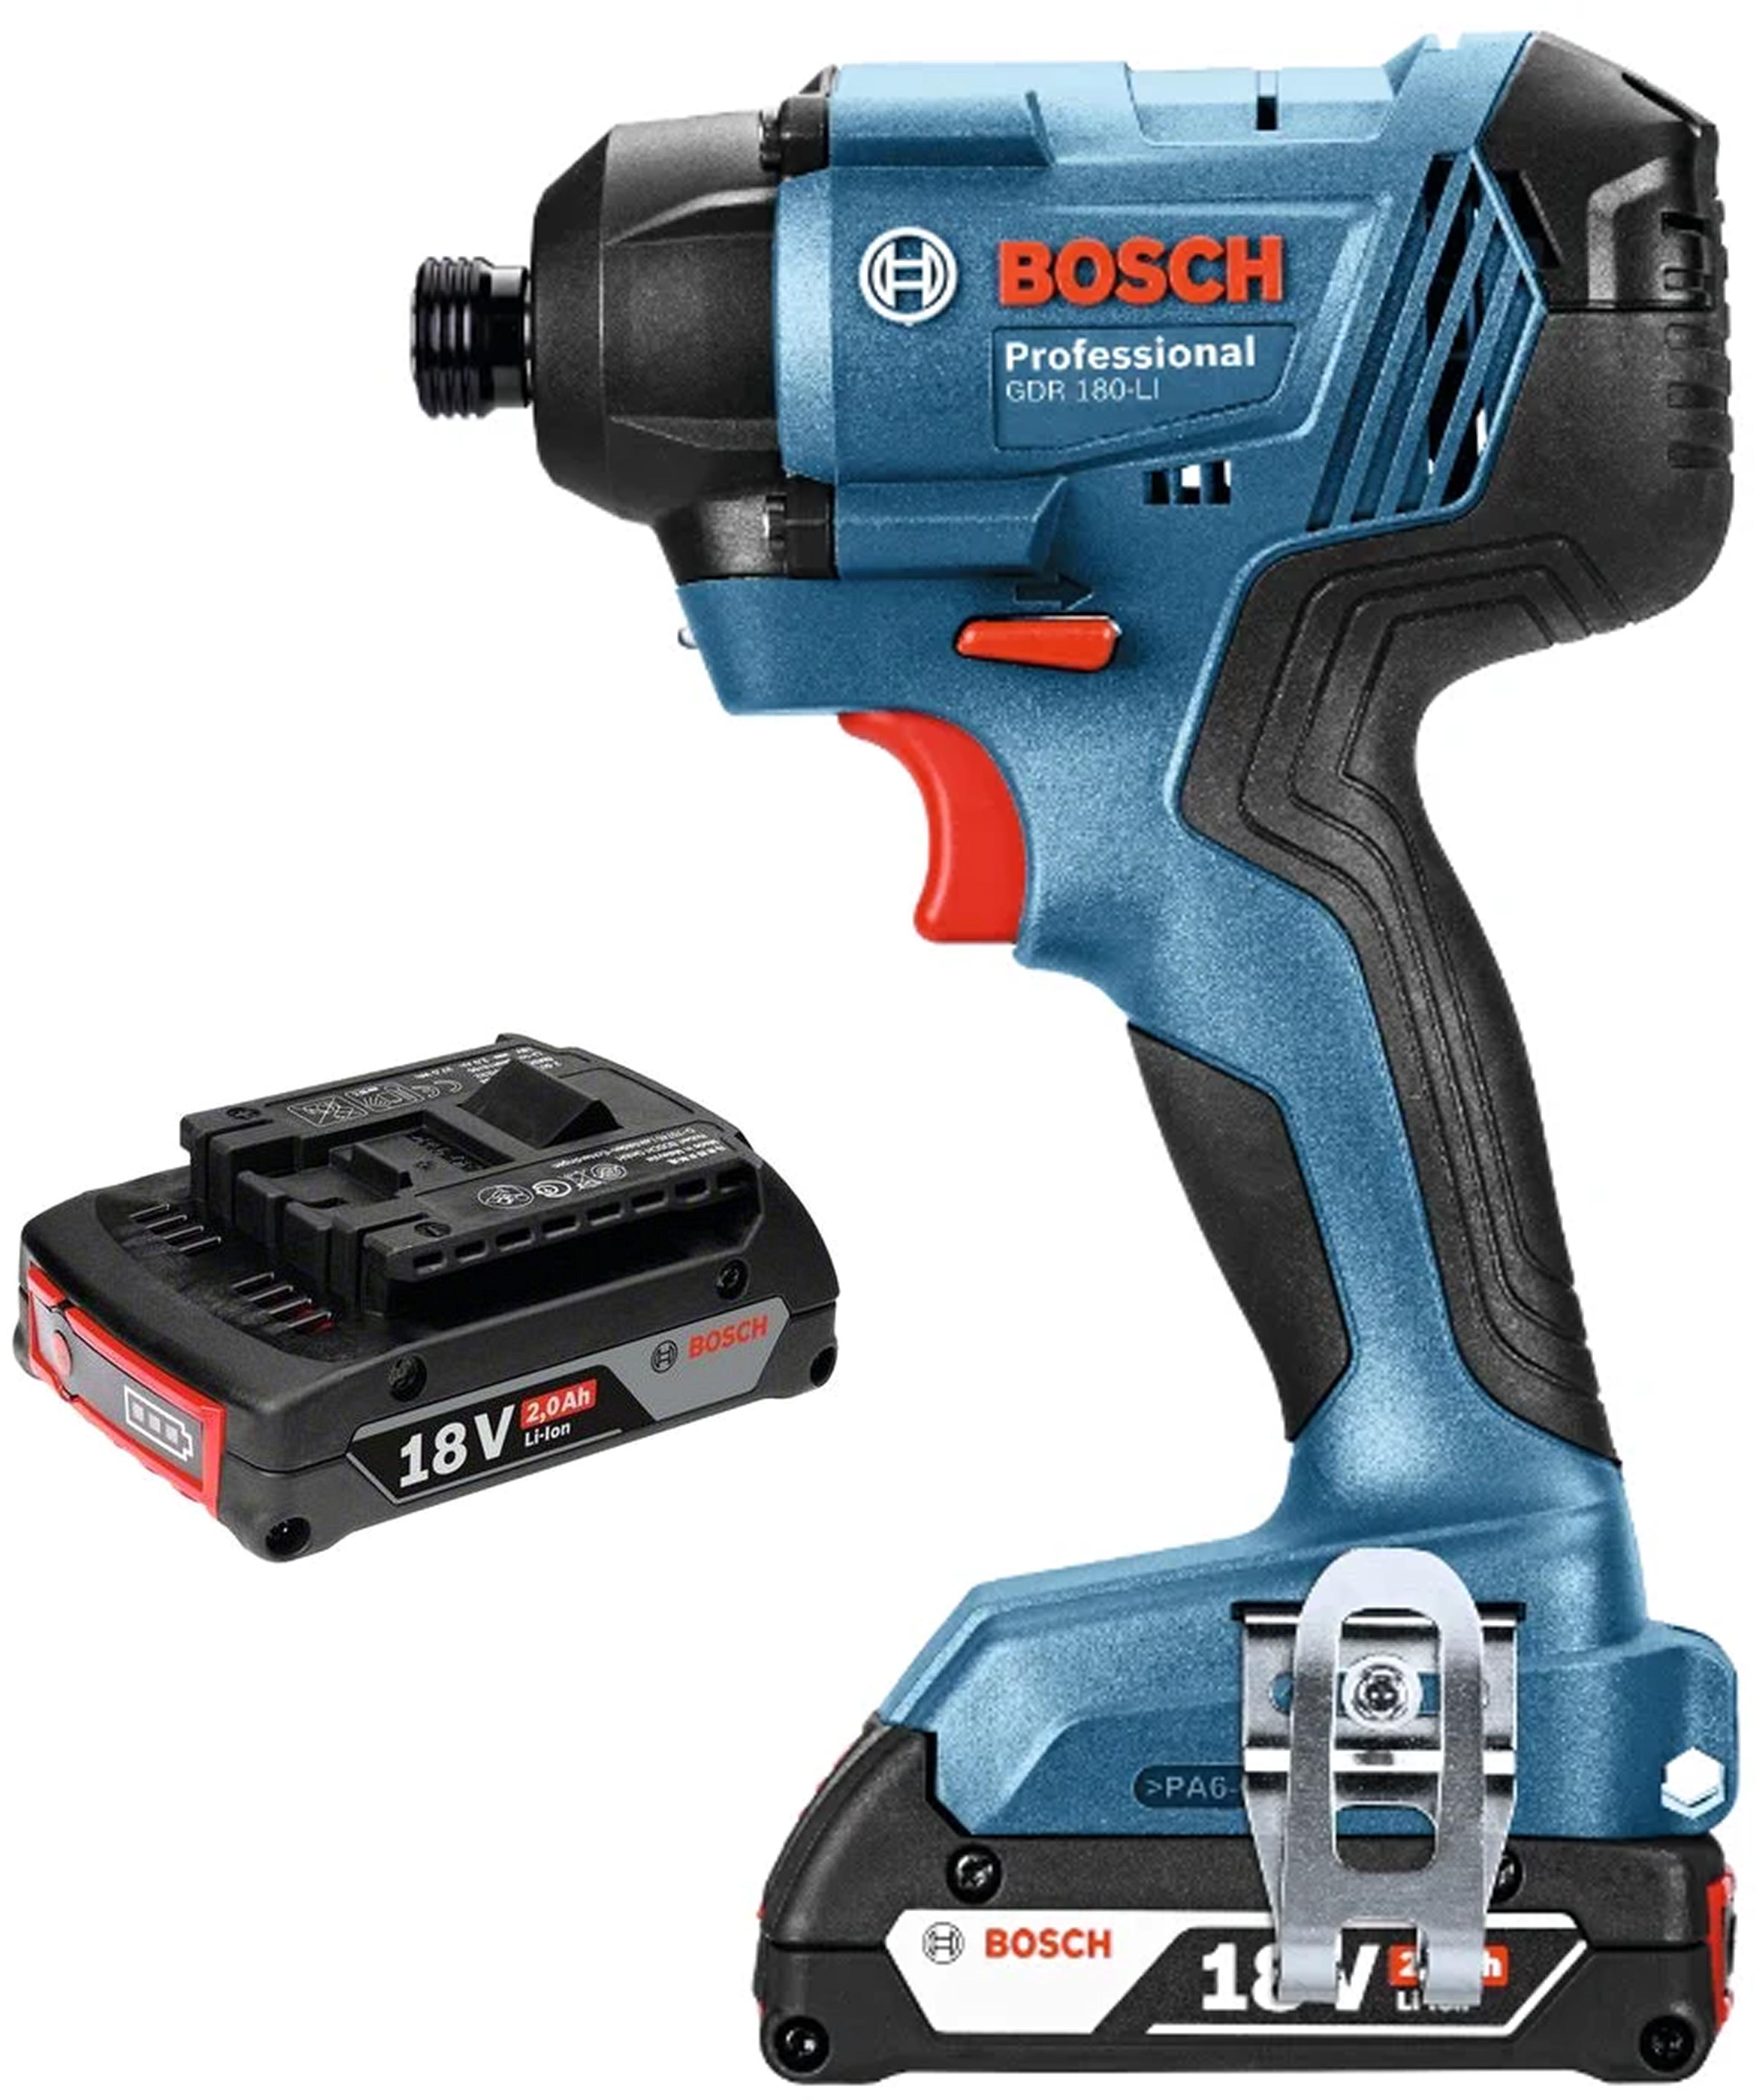 Набор Bosch Гайковерт аккумуляторный gdr 180-li (0.601.9g5.120) +Аккумулятор 1600z00036 аккумулятор